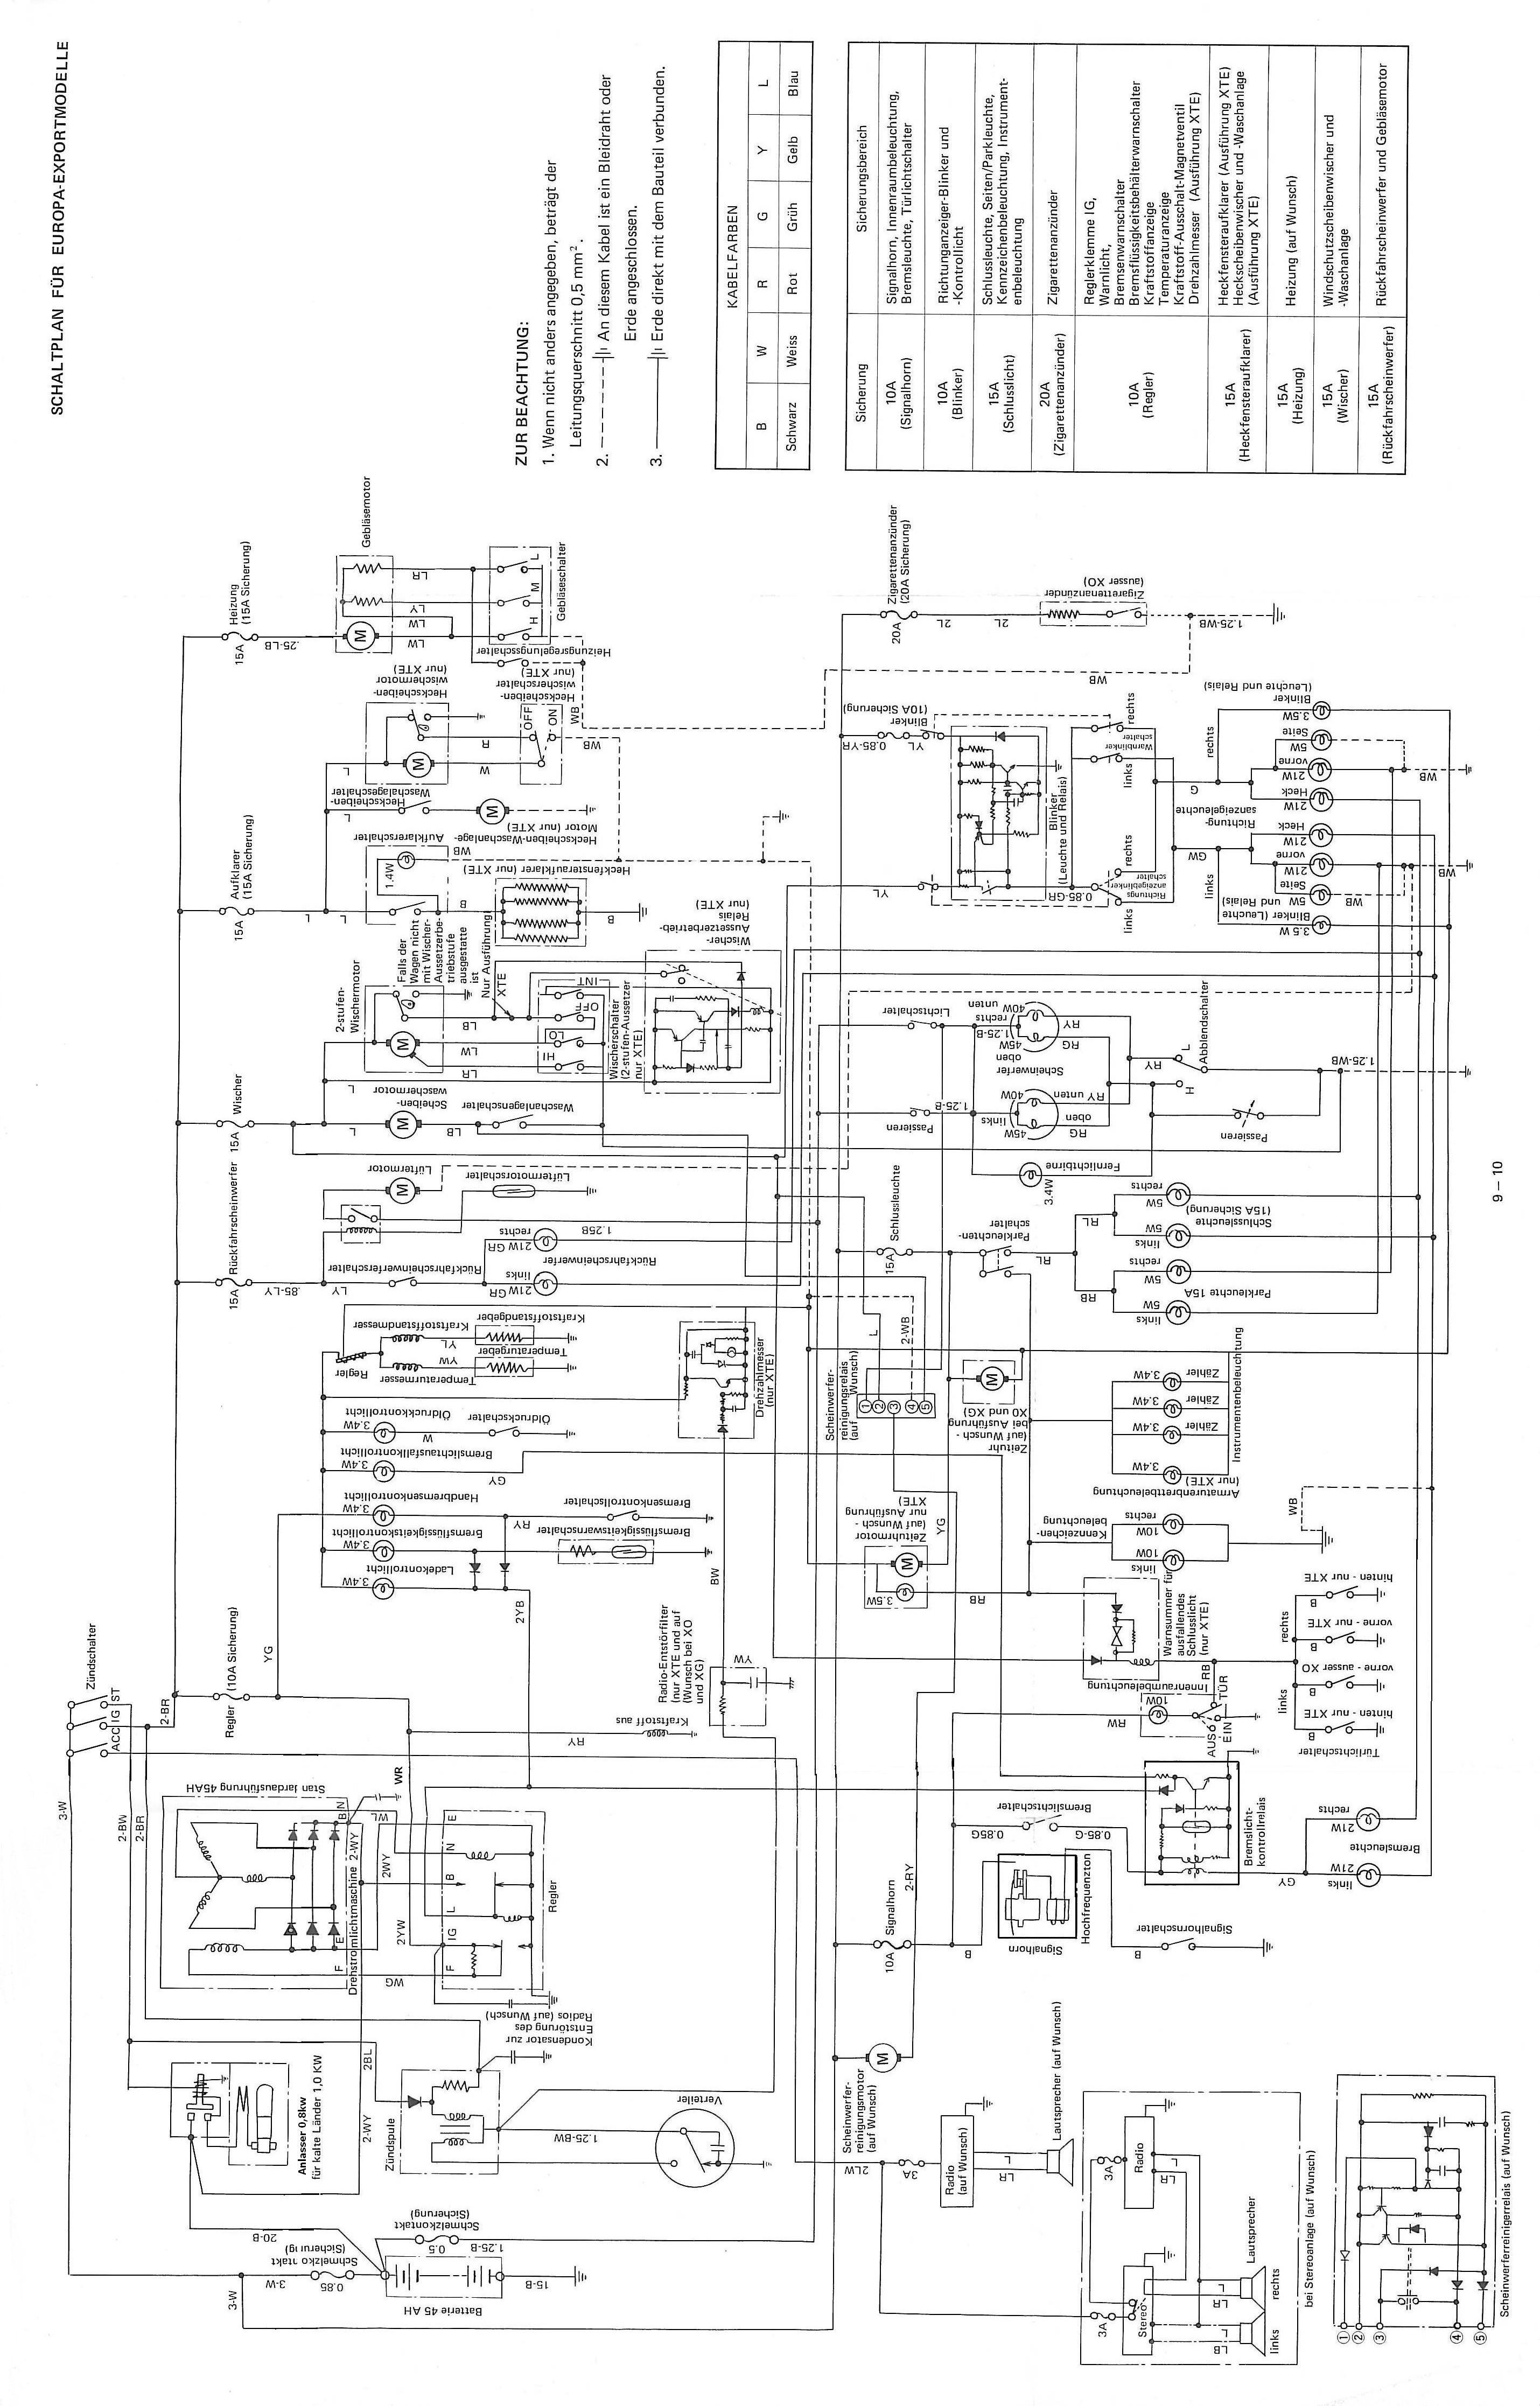 [DIAGRAM] 2000 Volvo S80 Wiring Diagrams Download